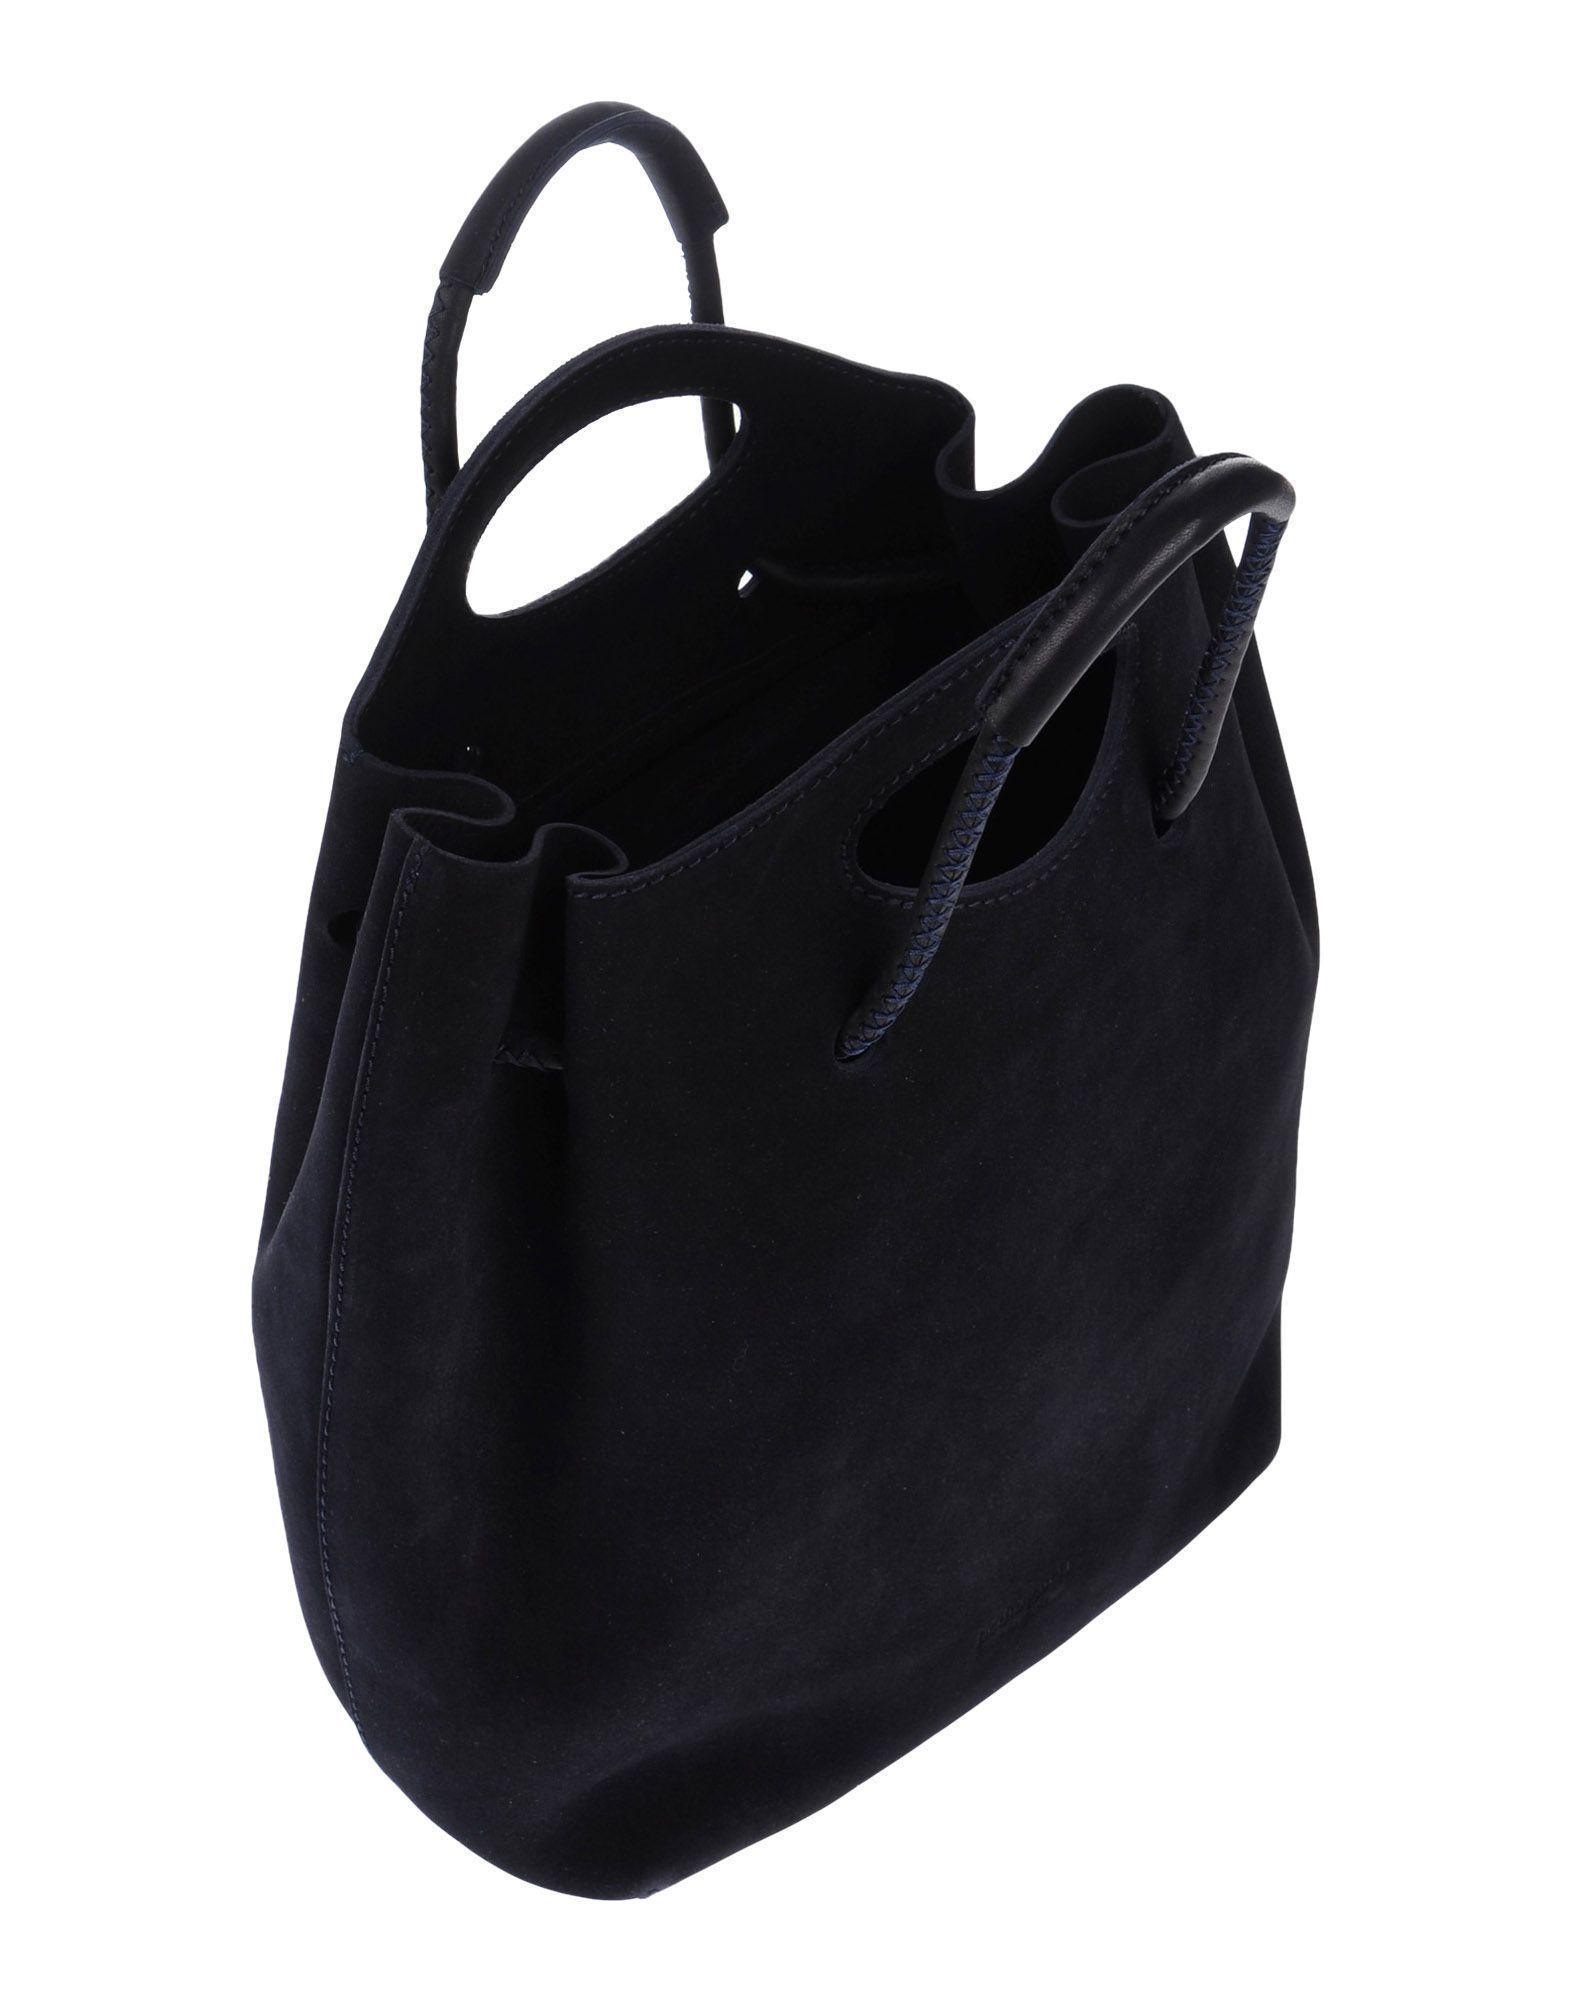 Luxury Pedro Garcia Suede Drawstring Tote  Handbags  PED23607  The